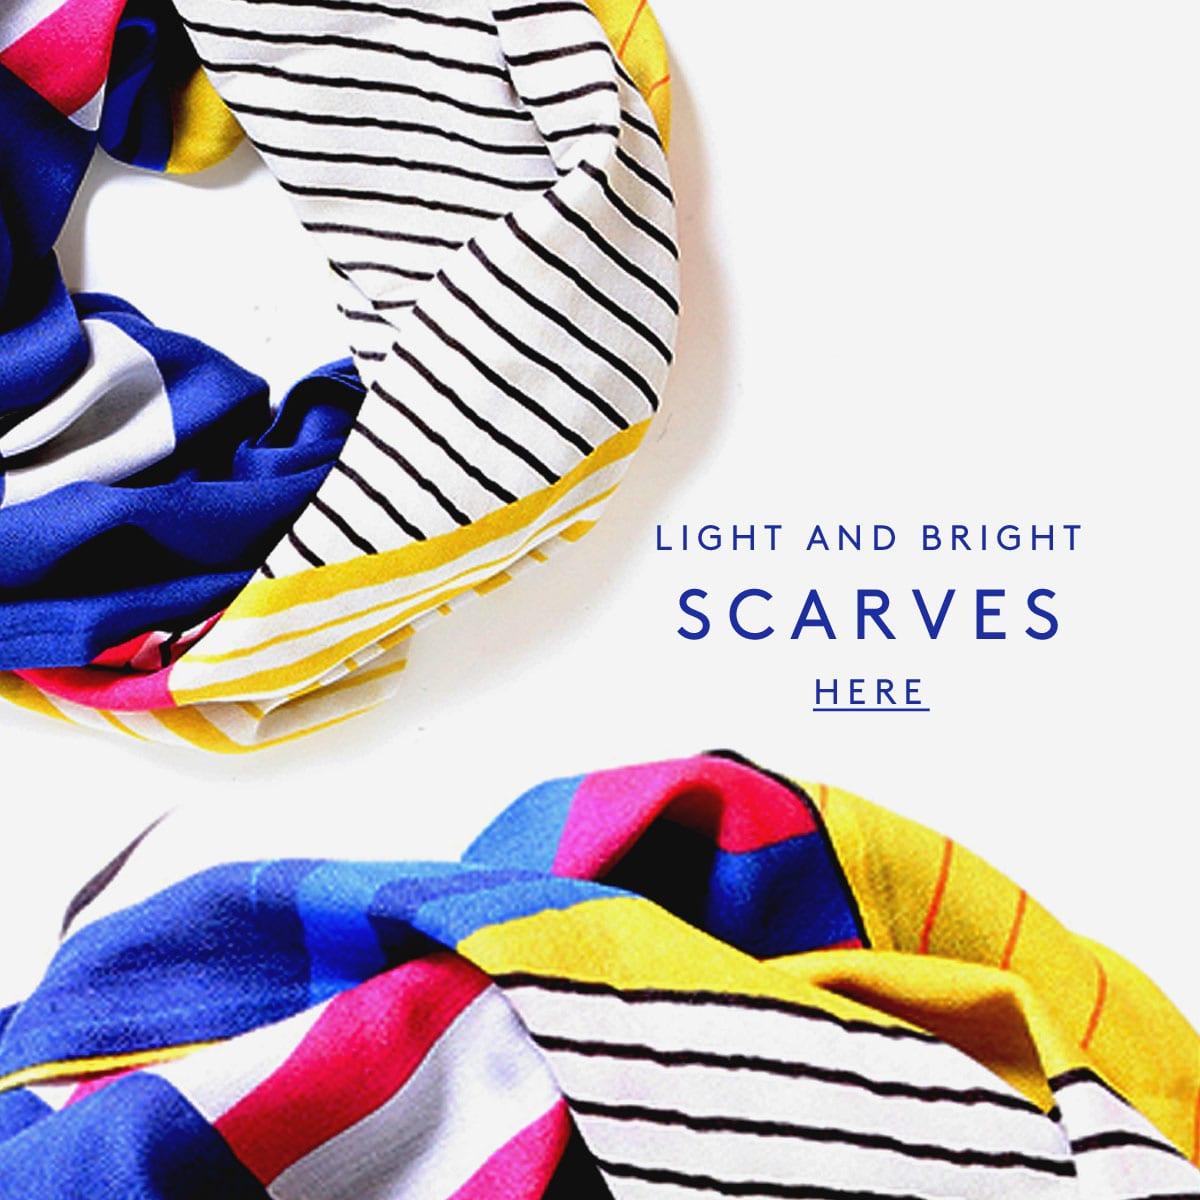 Lumi scarves